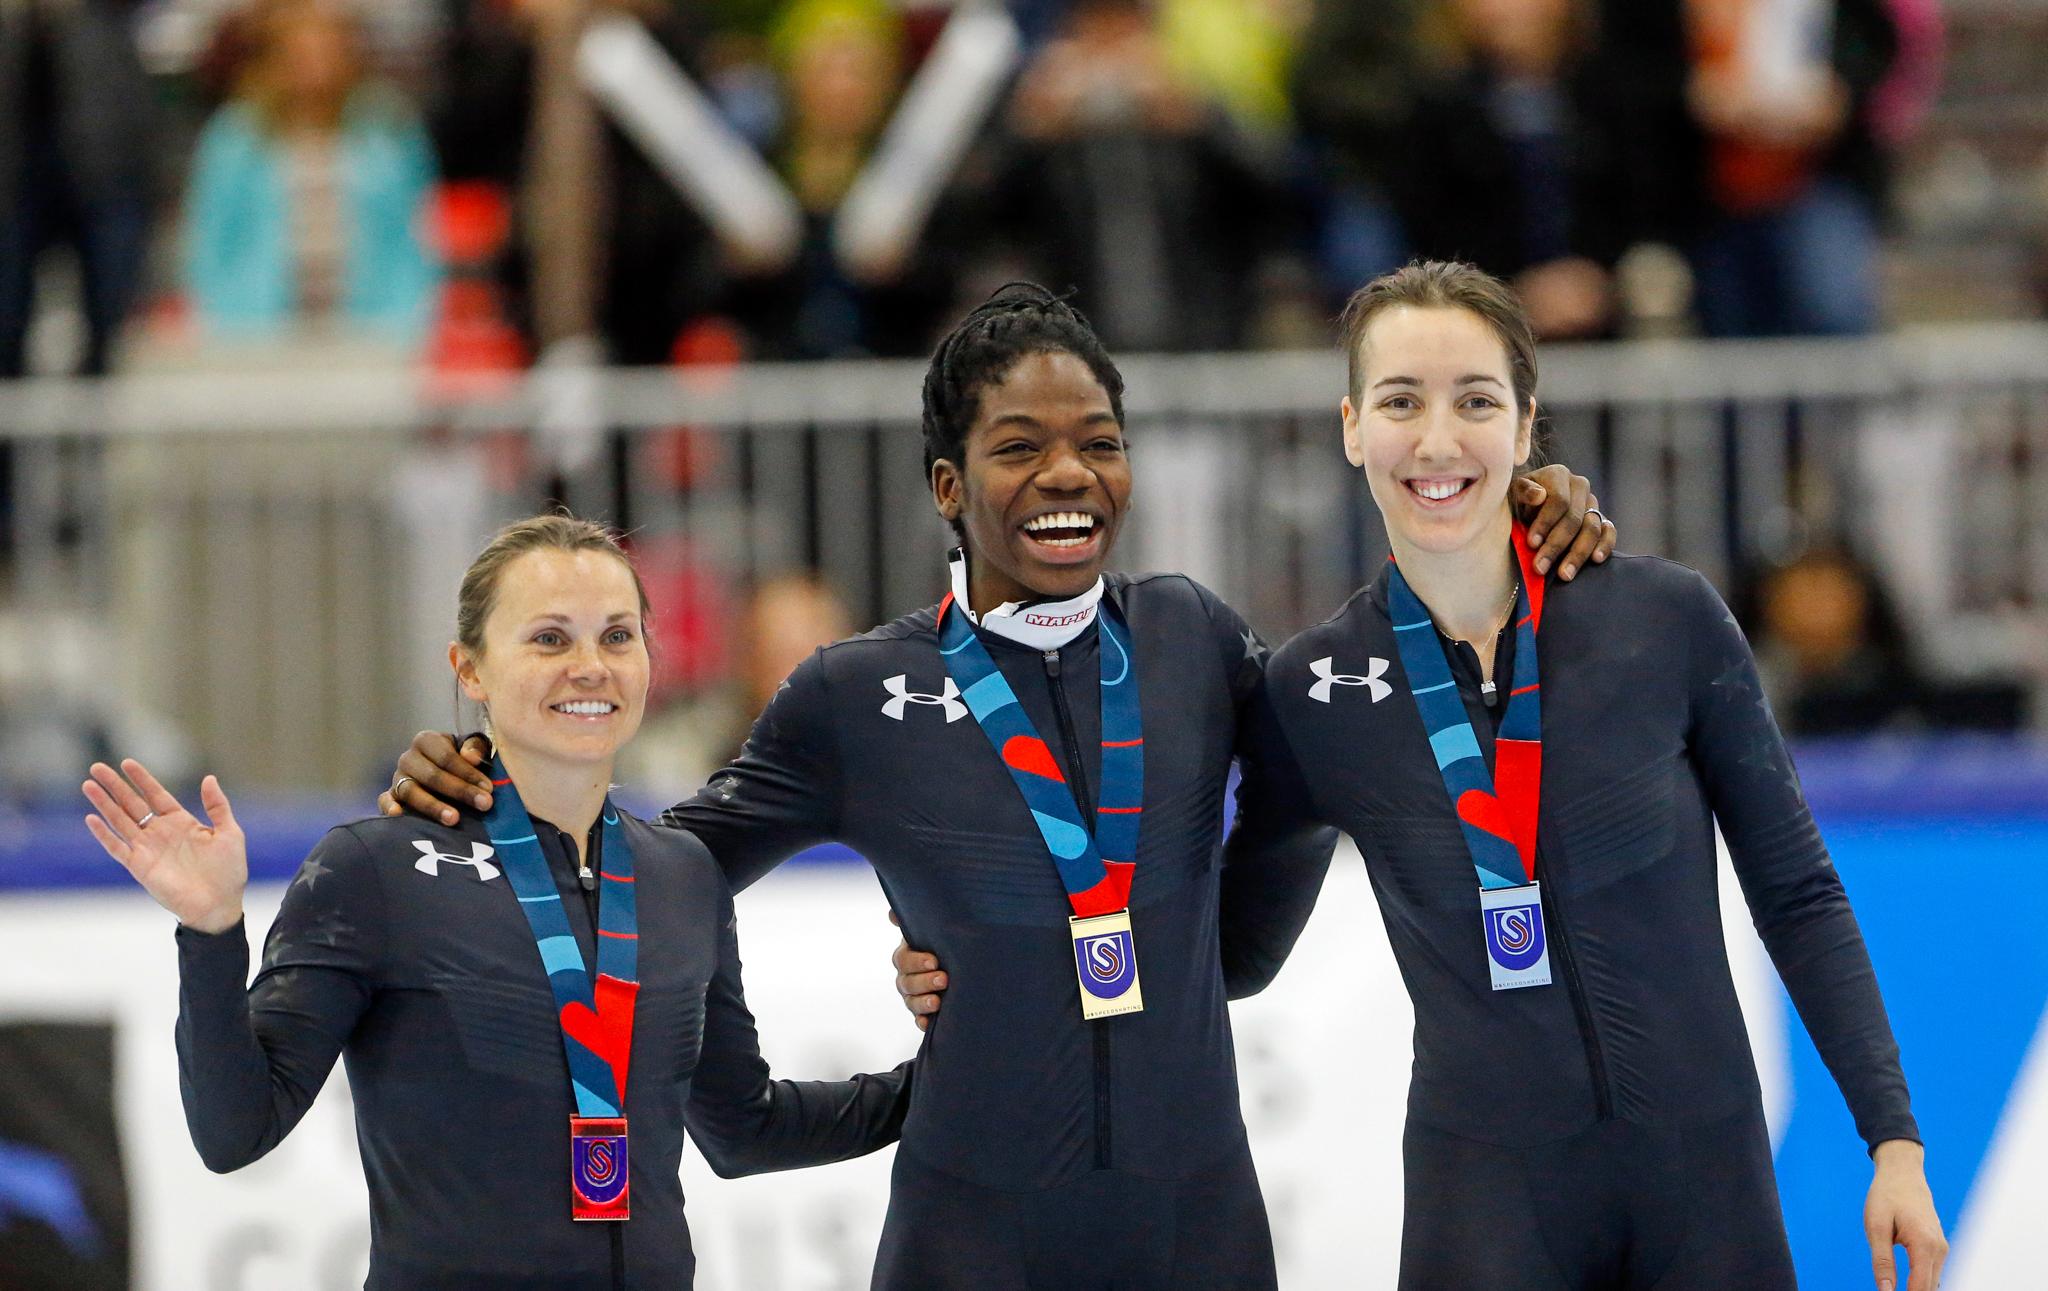 Three speedskaters wearing medals (© AP Images)